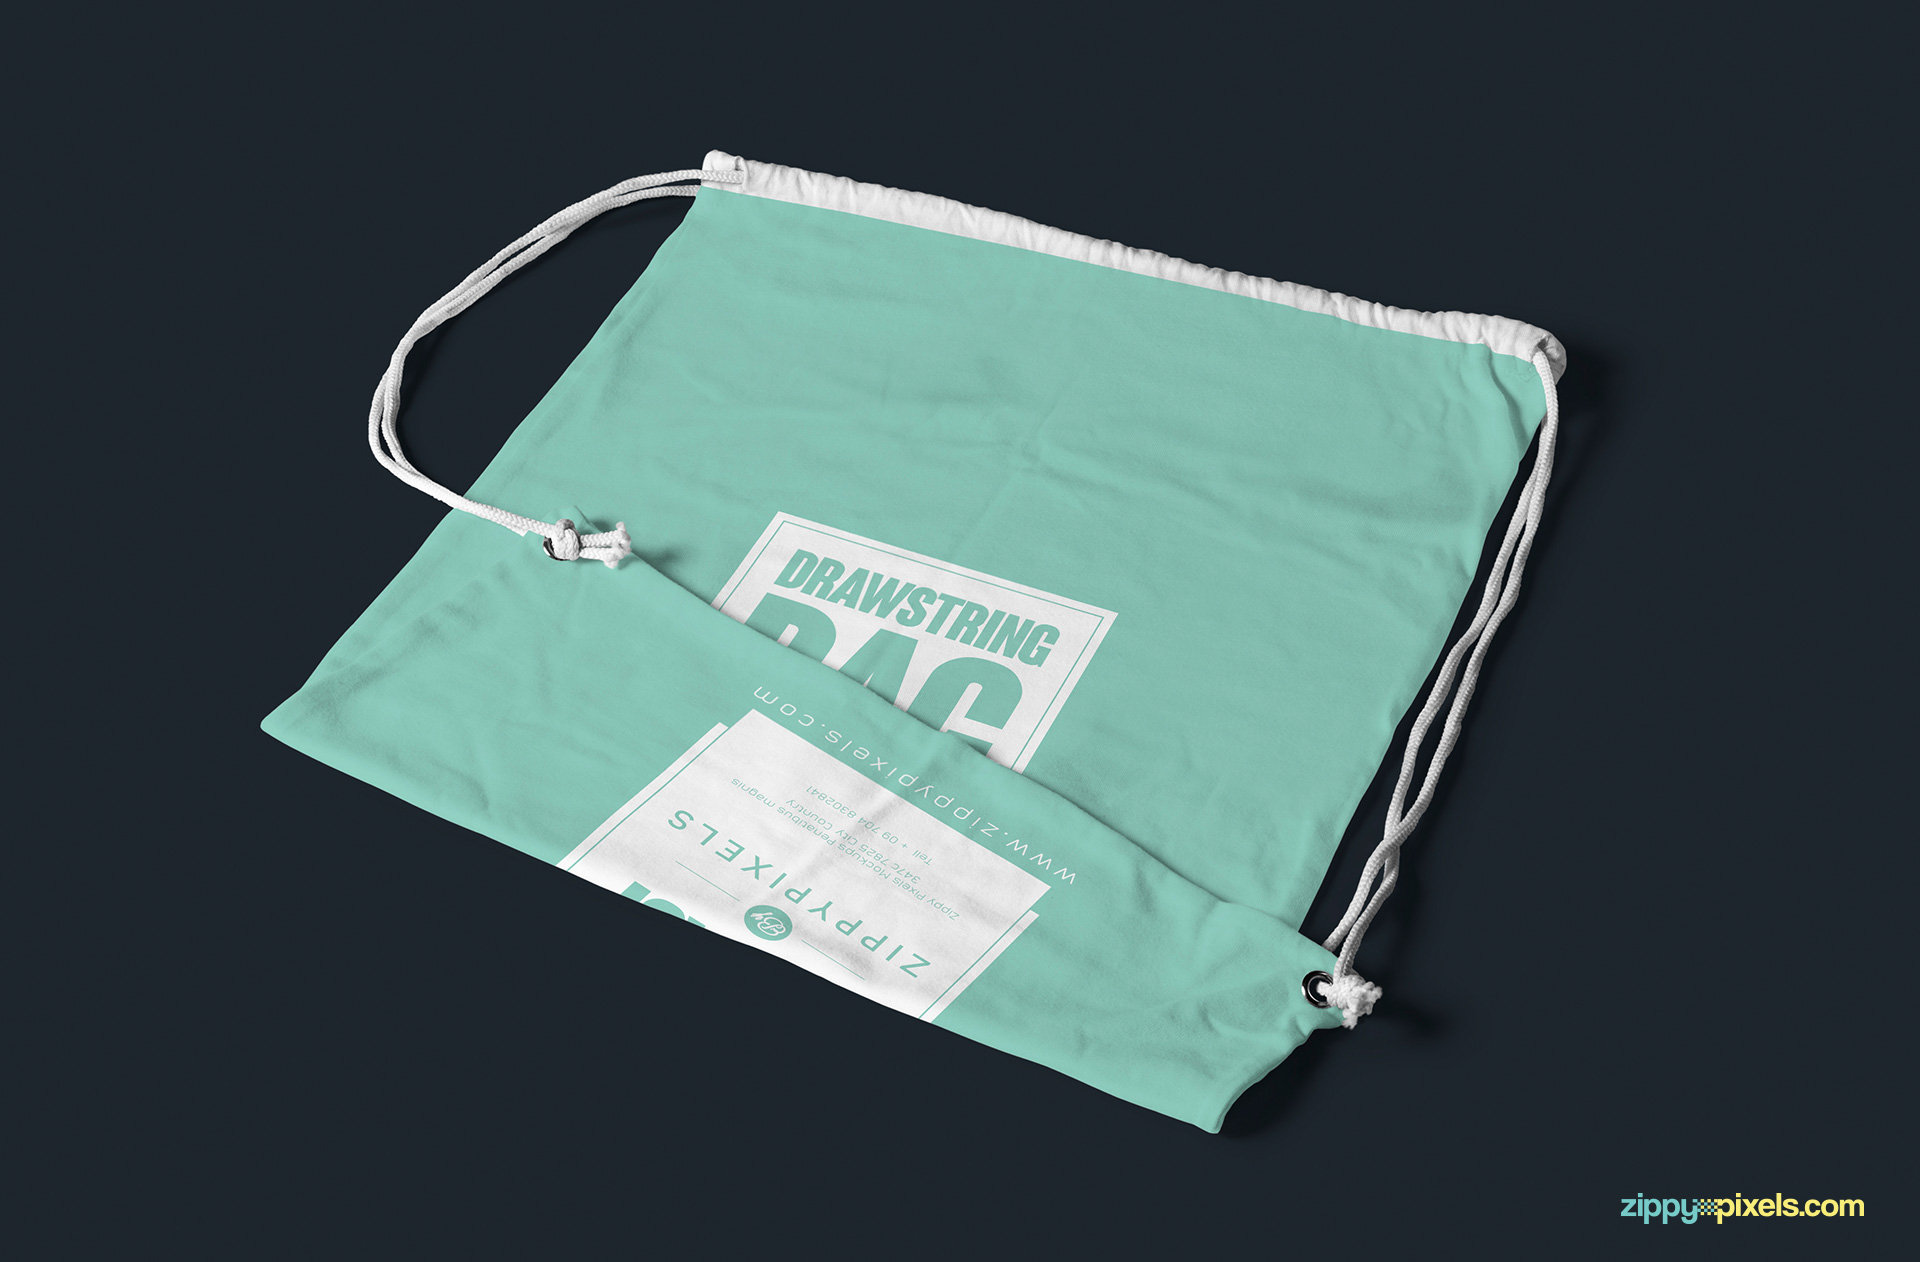 drawstring-bag-empty-folded-mock-up